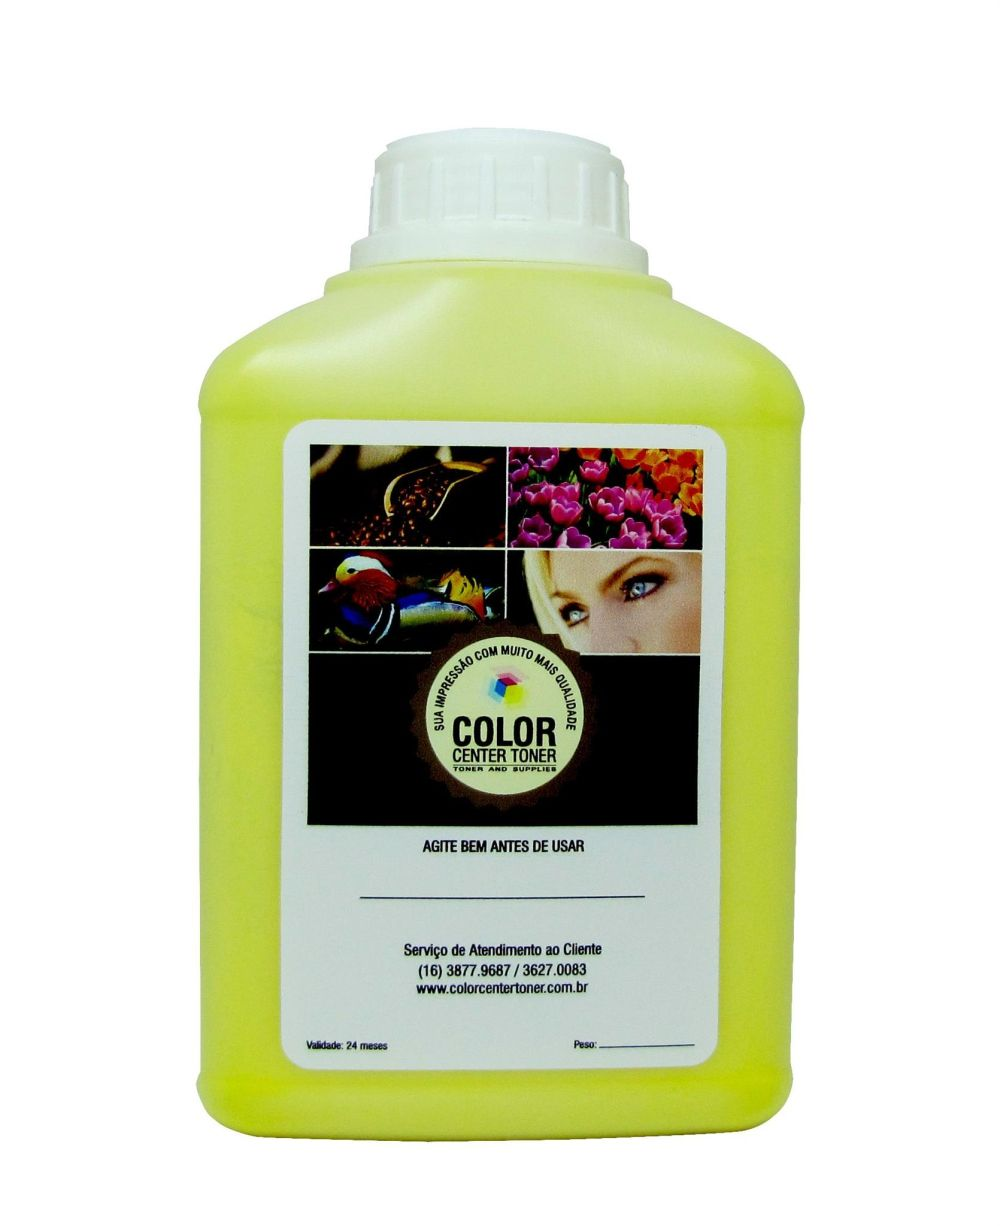 Refil de Toner Minolta 4650 séries Amarelo